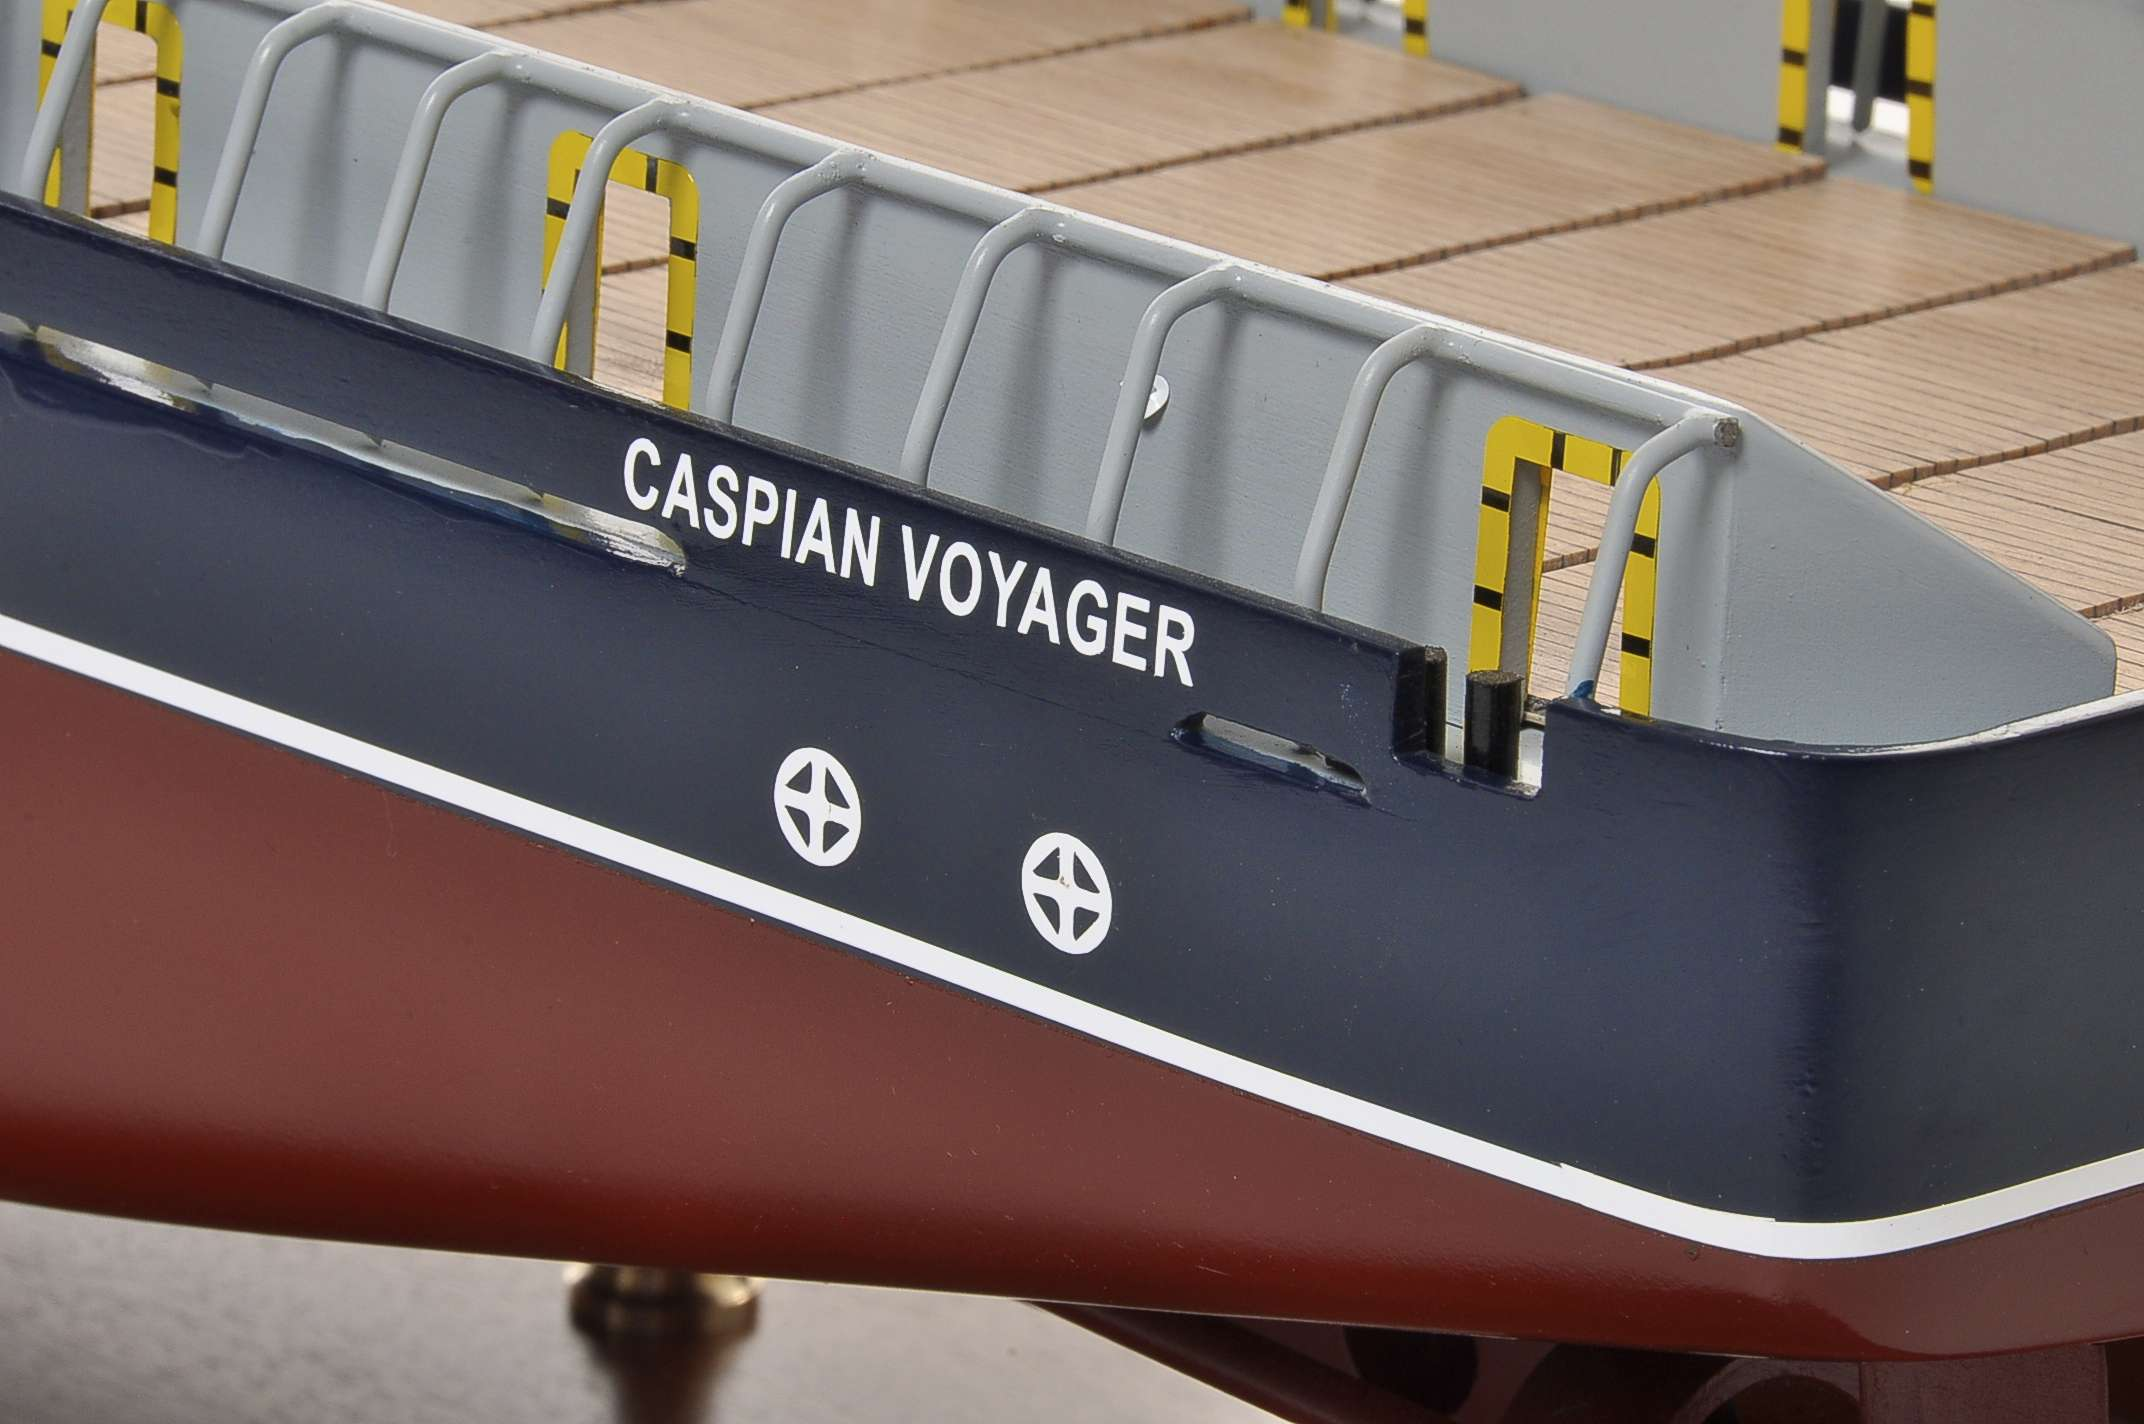 1476-4339-Caspian-Voyager